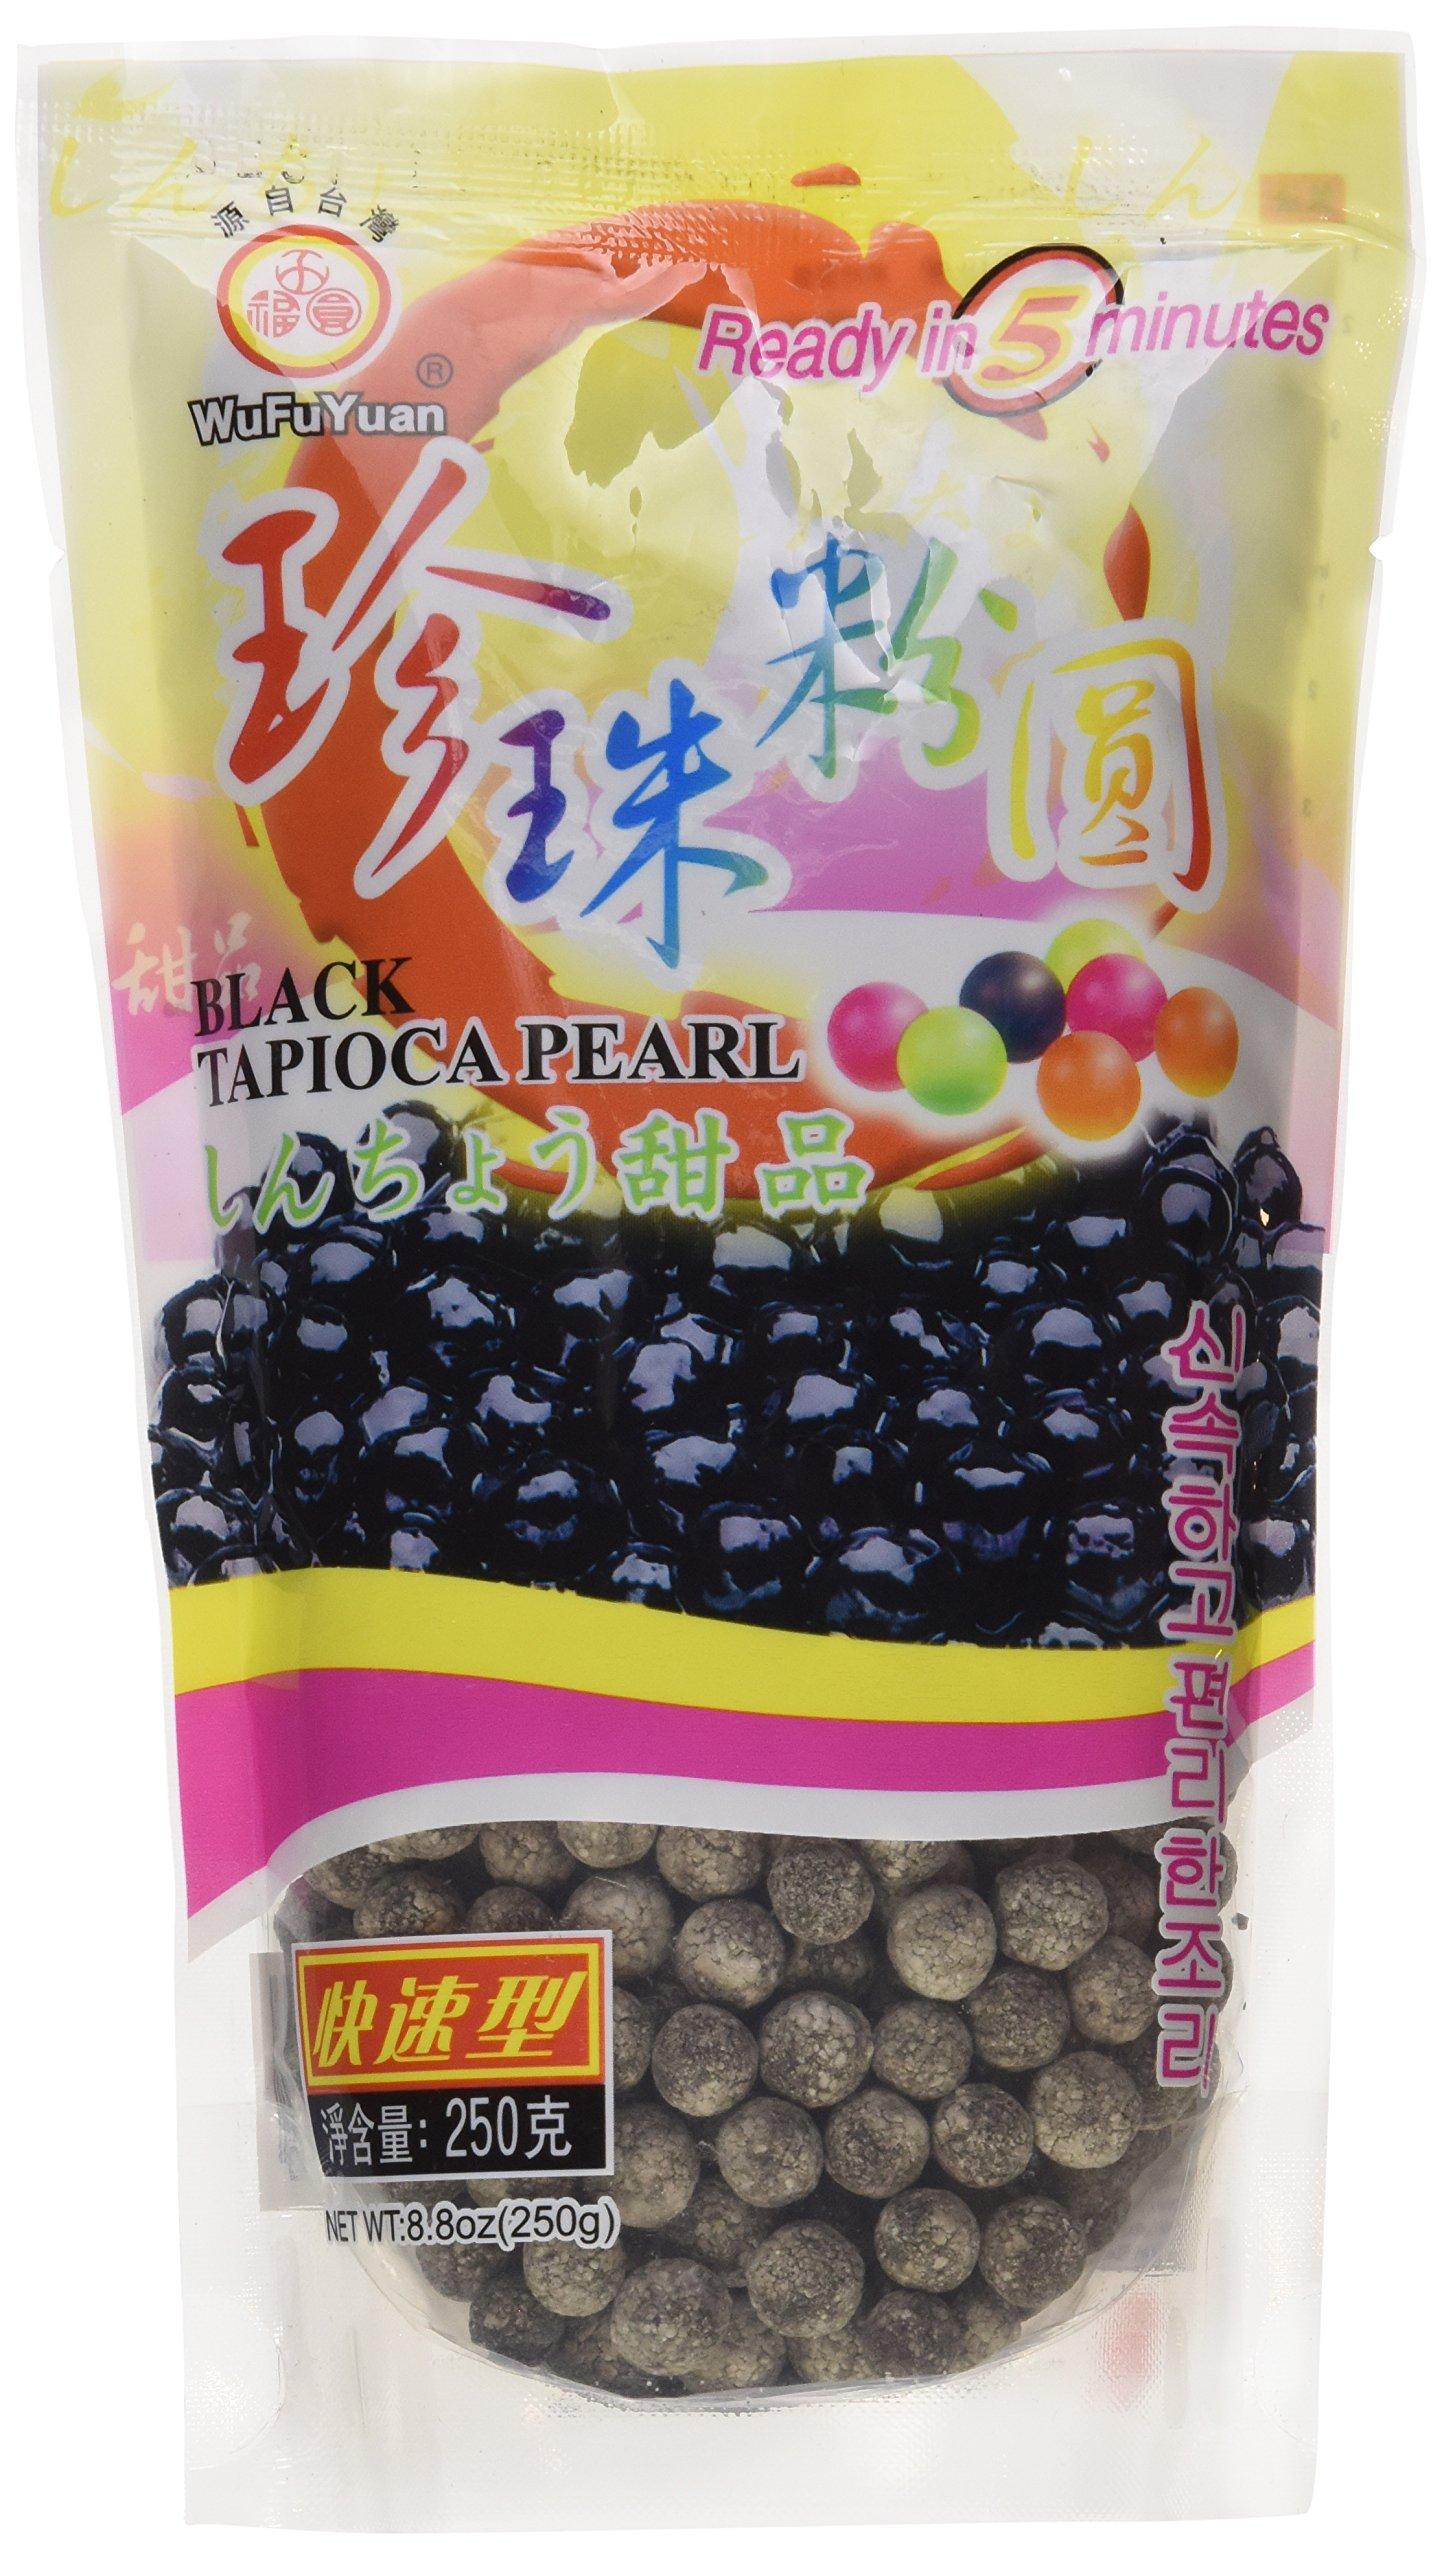 WuFuYuan - Tapioca Pearl (Black) - Net Wt. 8.8 Oz.